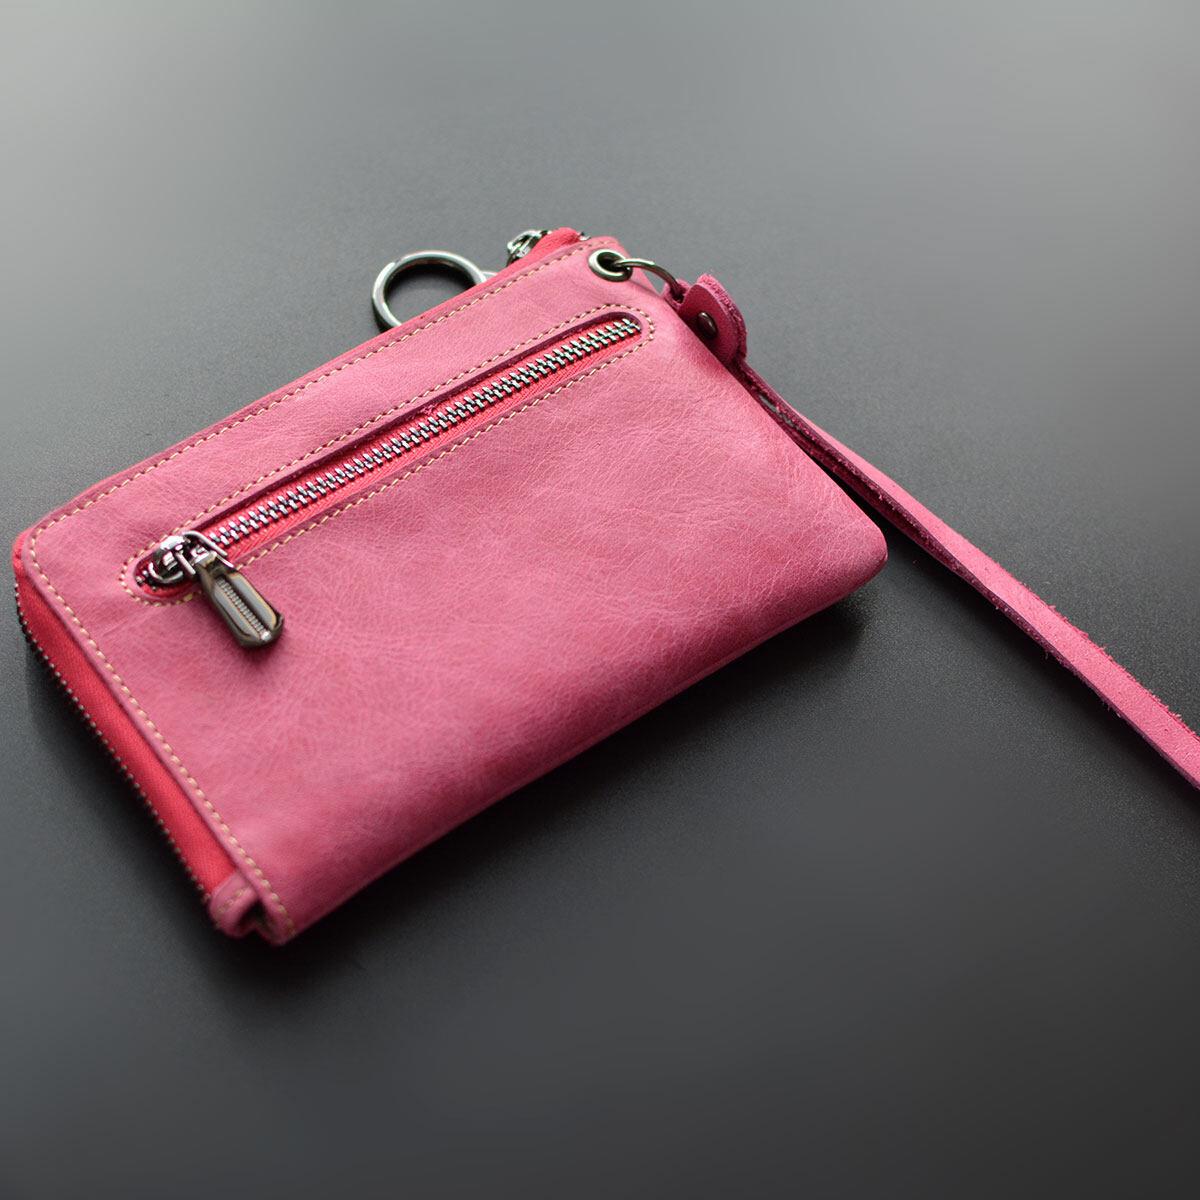 Leather mini zip coin loose money bag small purse (Peachy)